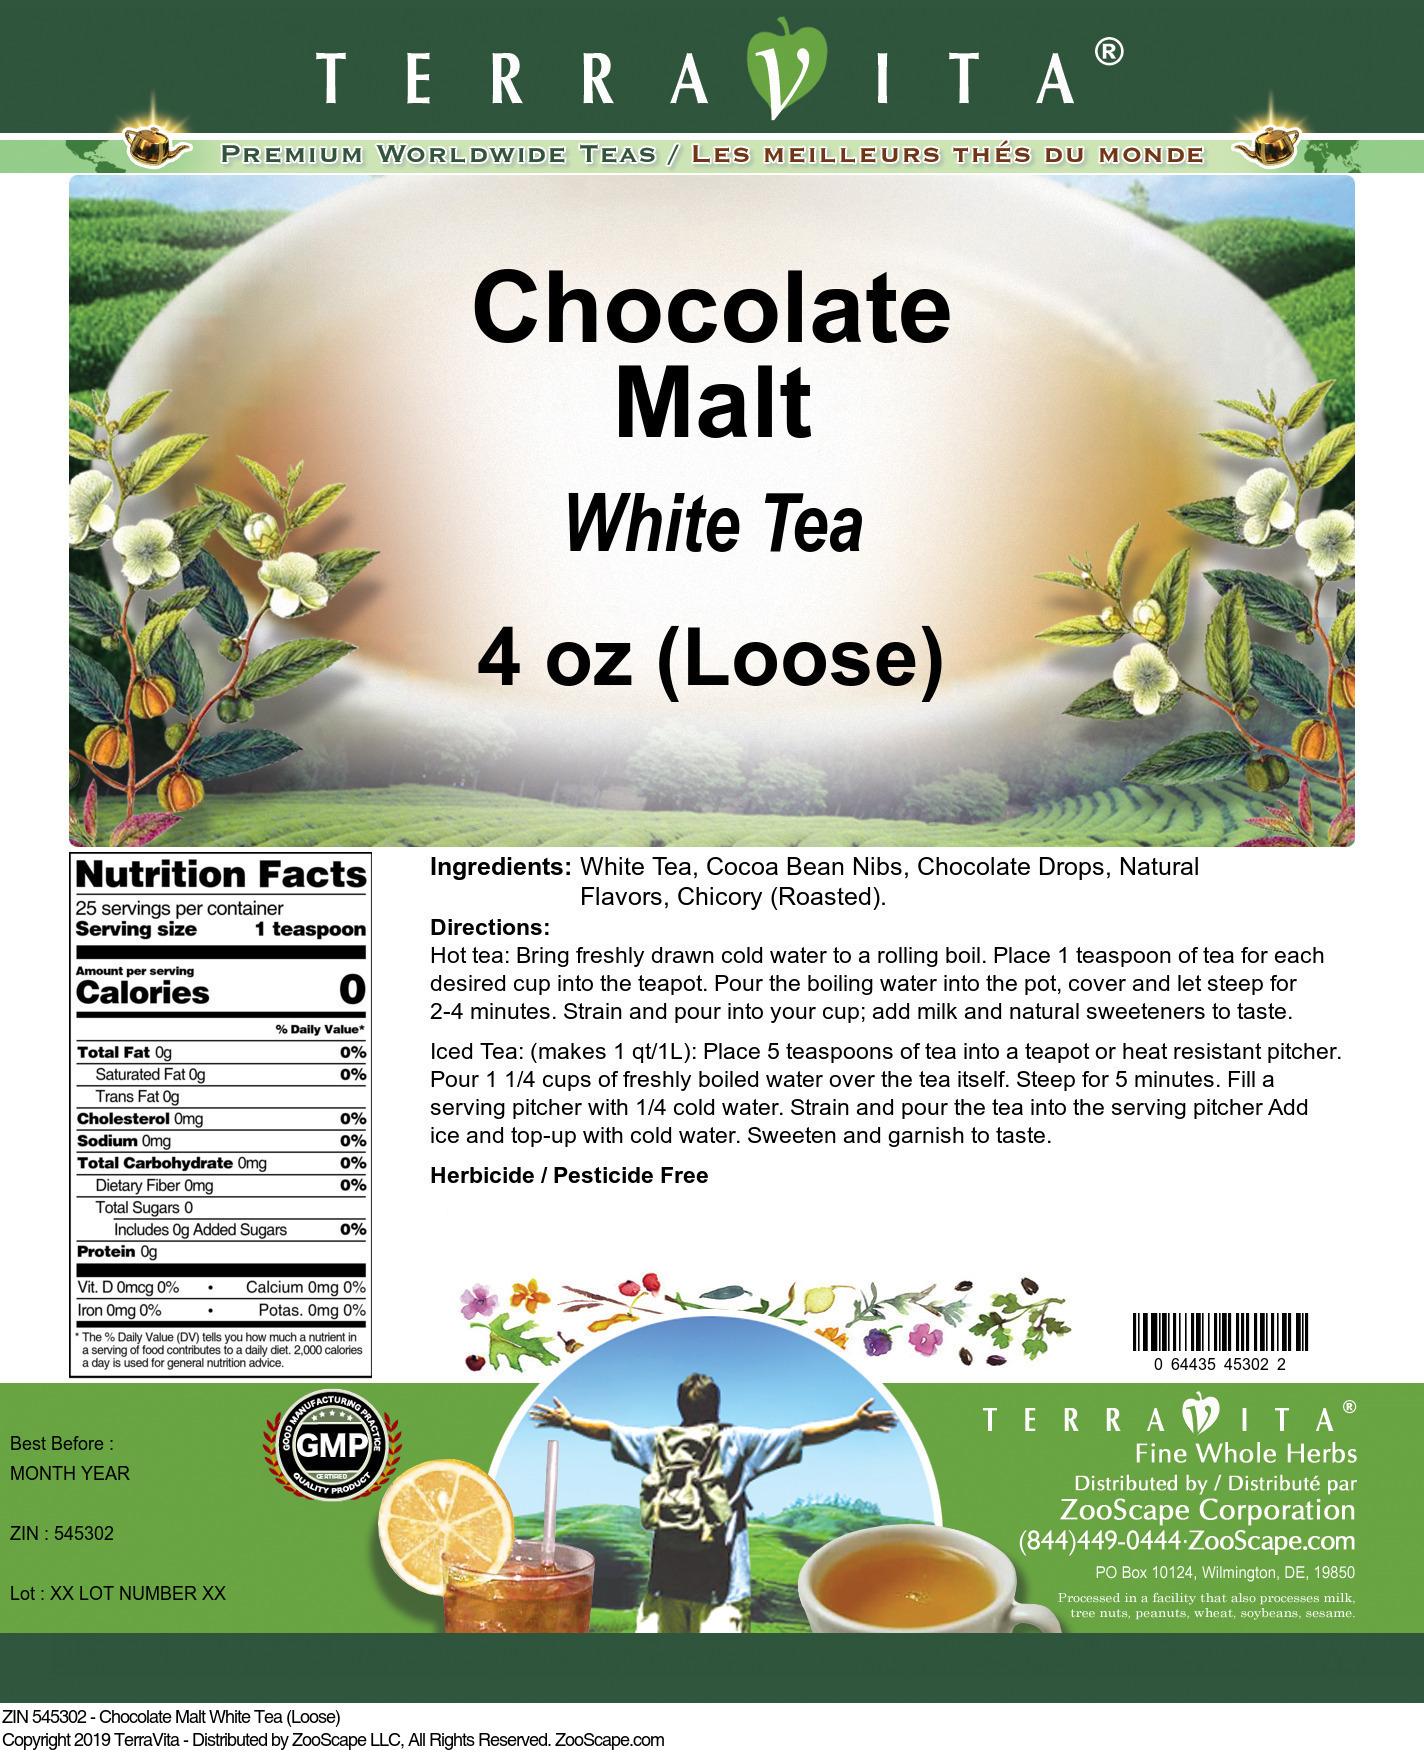 Chocolate Malt White Tea (Loose)